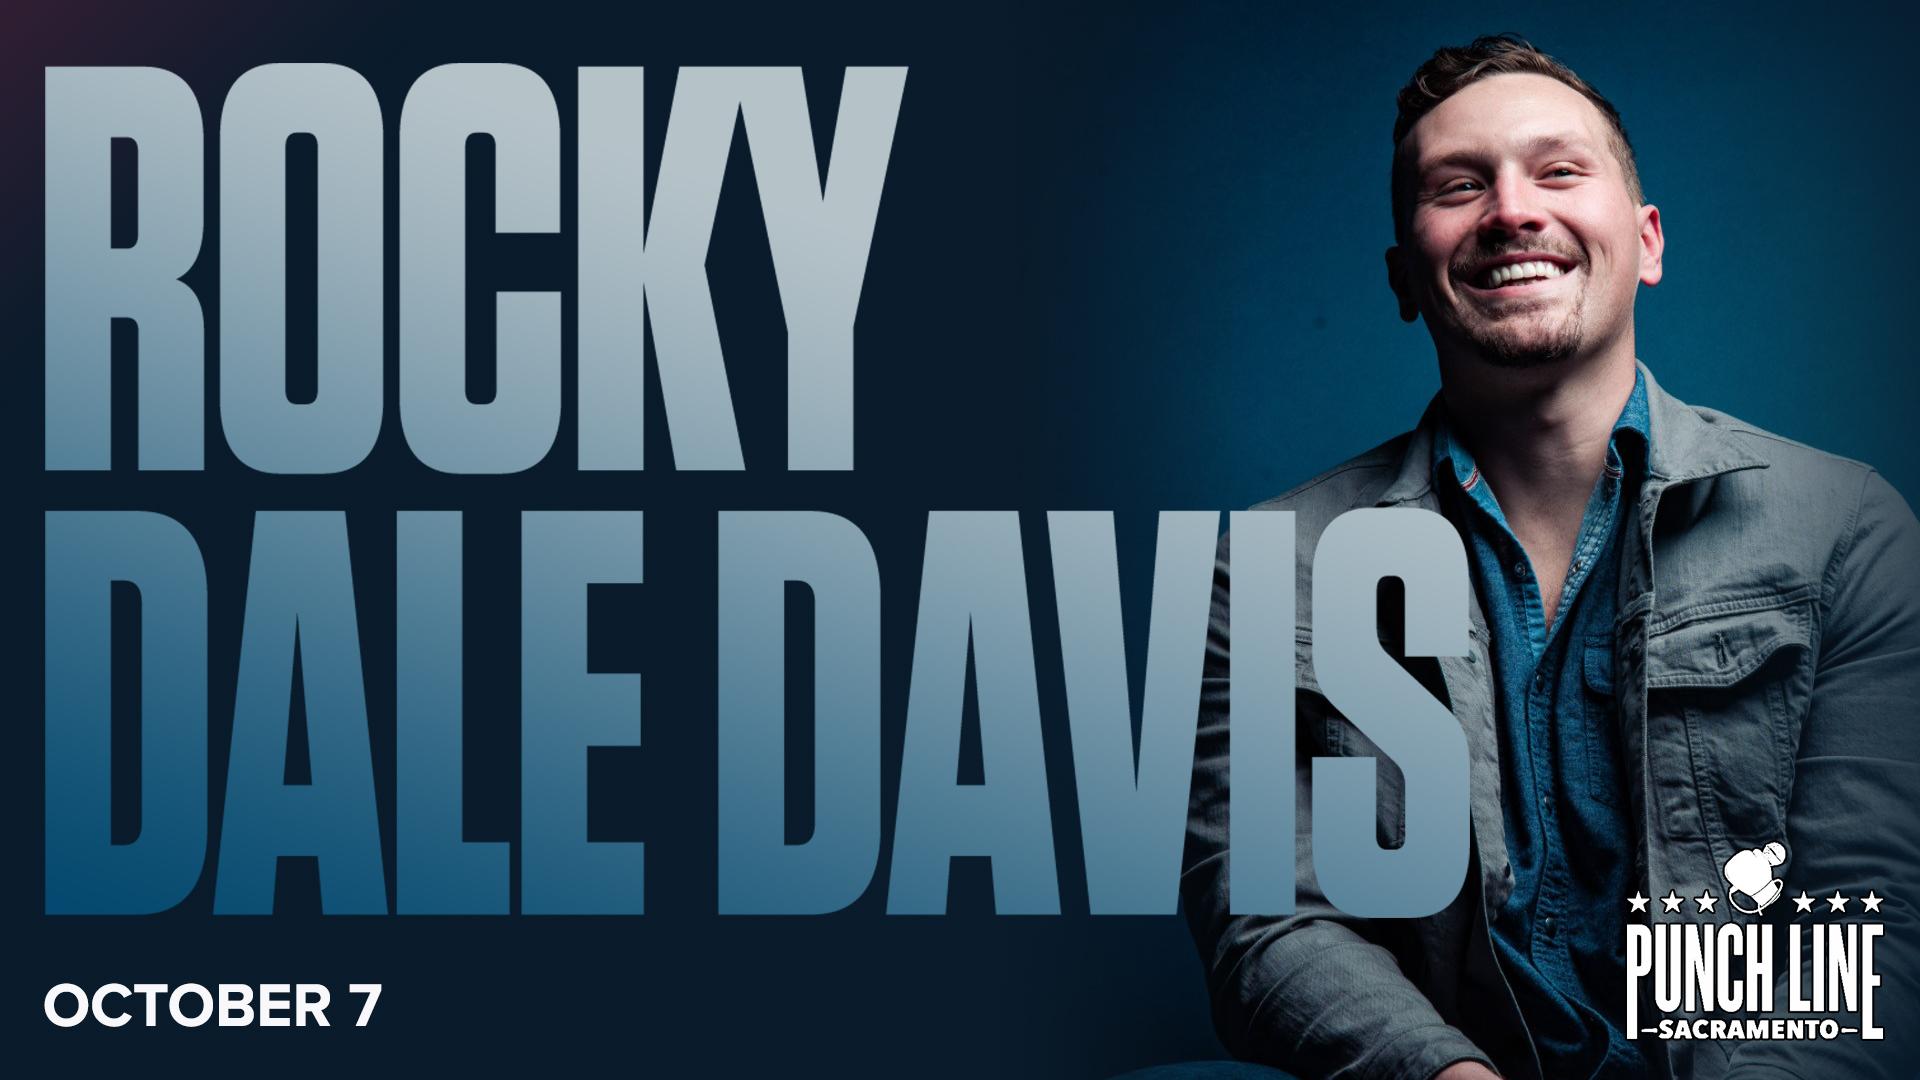 Rocky Dale Davis